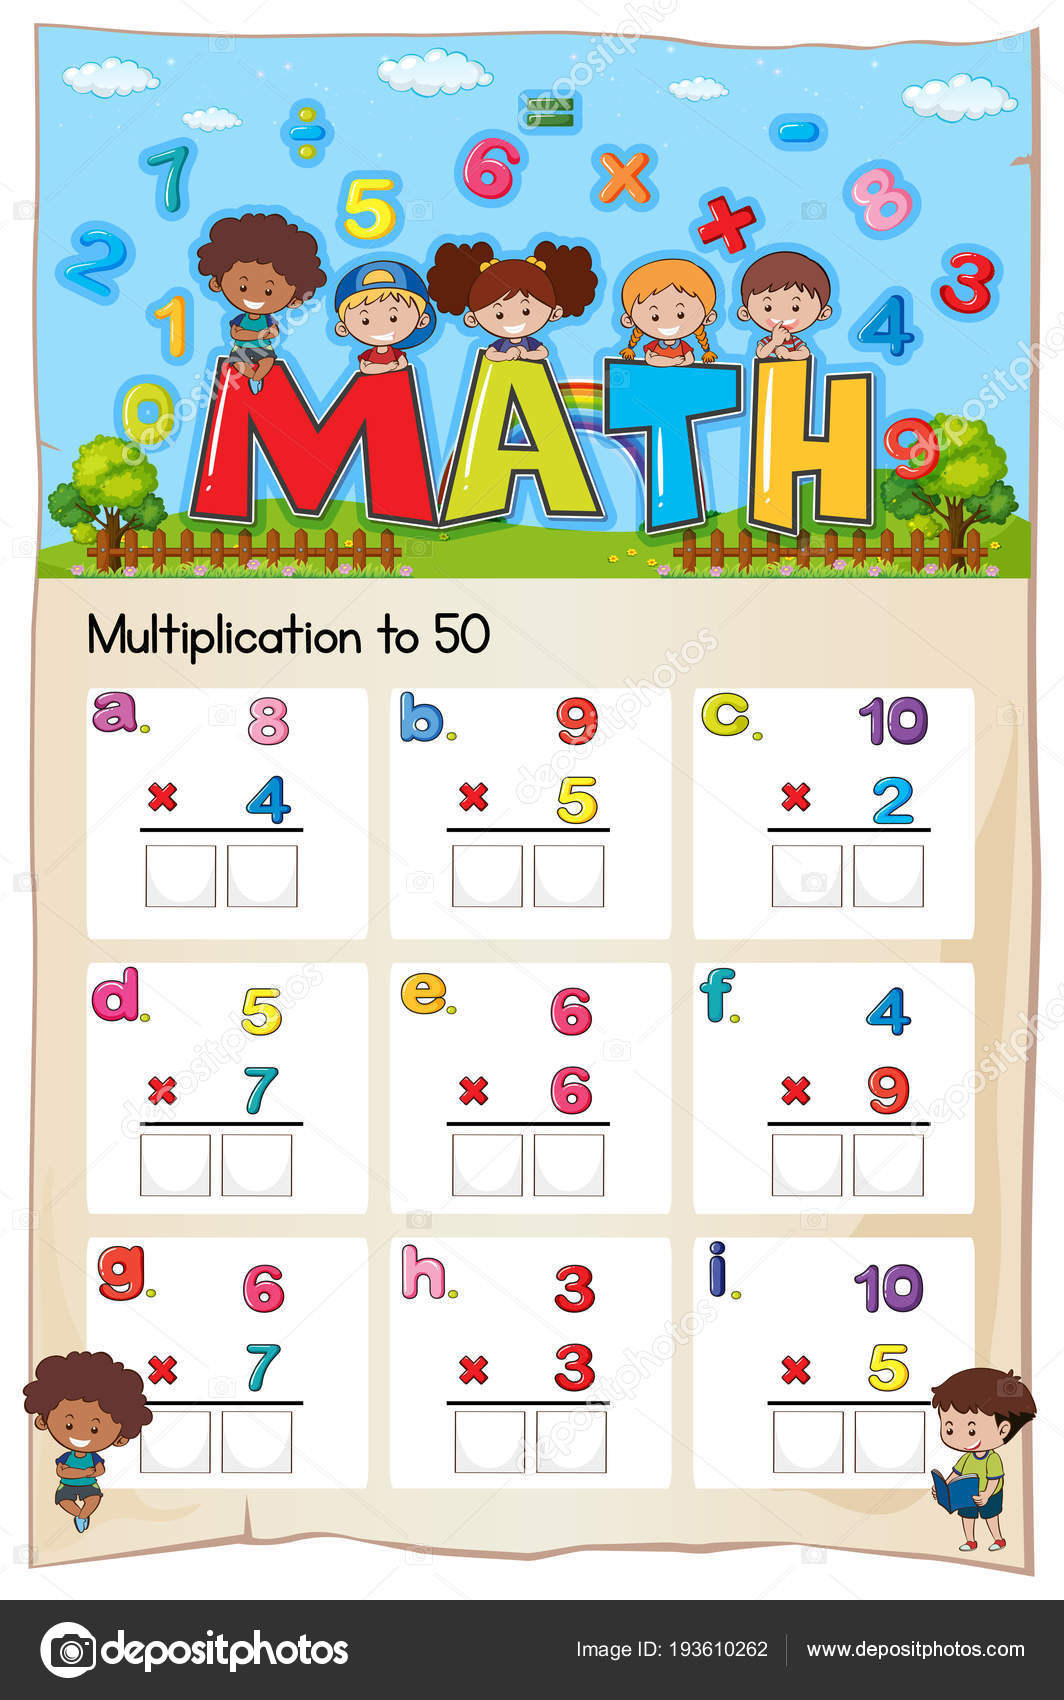 Mathematik Multiplikation Arbeitsblatt für Schüler — Stockvektor ...